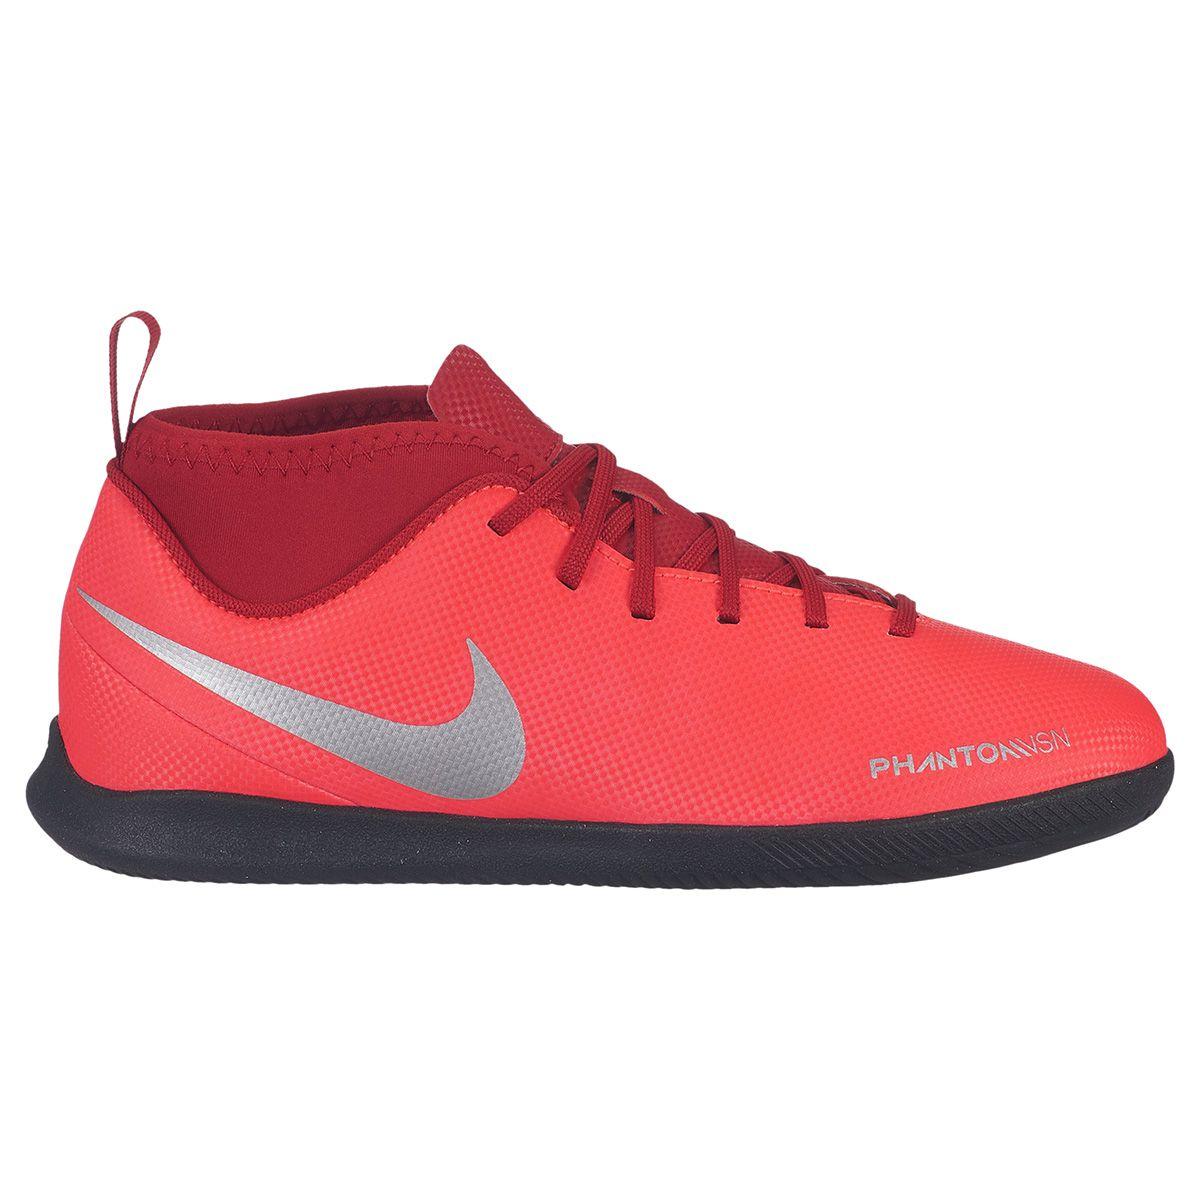 ce2fa9d37de3d Tenis Futsal Nike Phantom VSN Botinha Infantil - SPORT CENTER JARAGUÁ